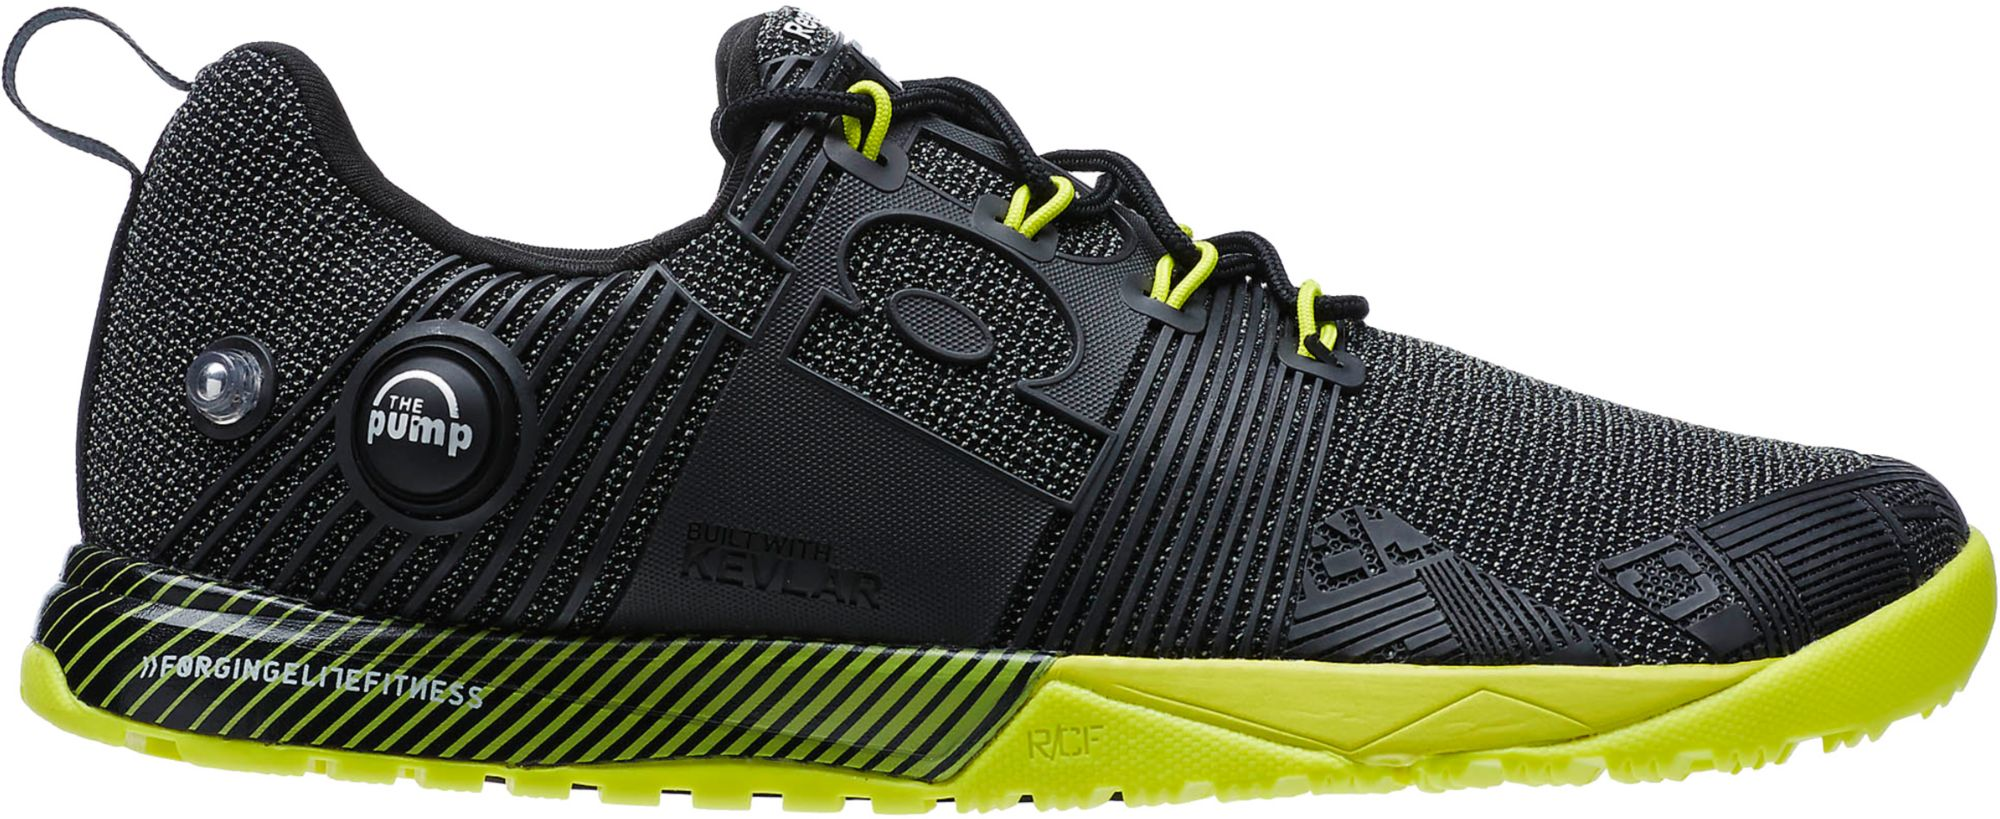 Reebok Women's CrossFit Nano Pump Fusion Training Shoes | DICK'S Sporting  Goods